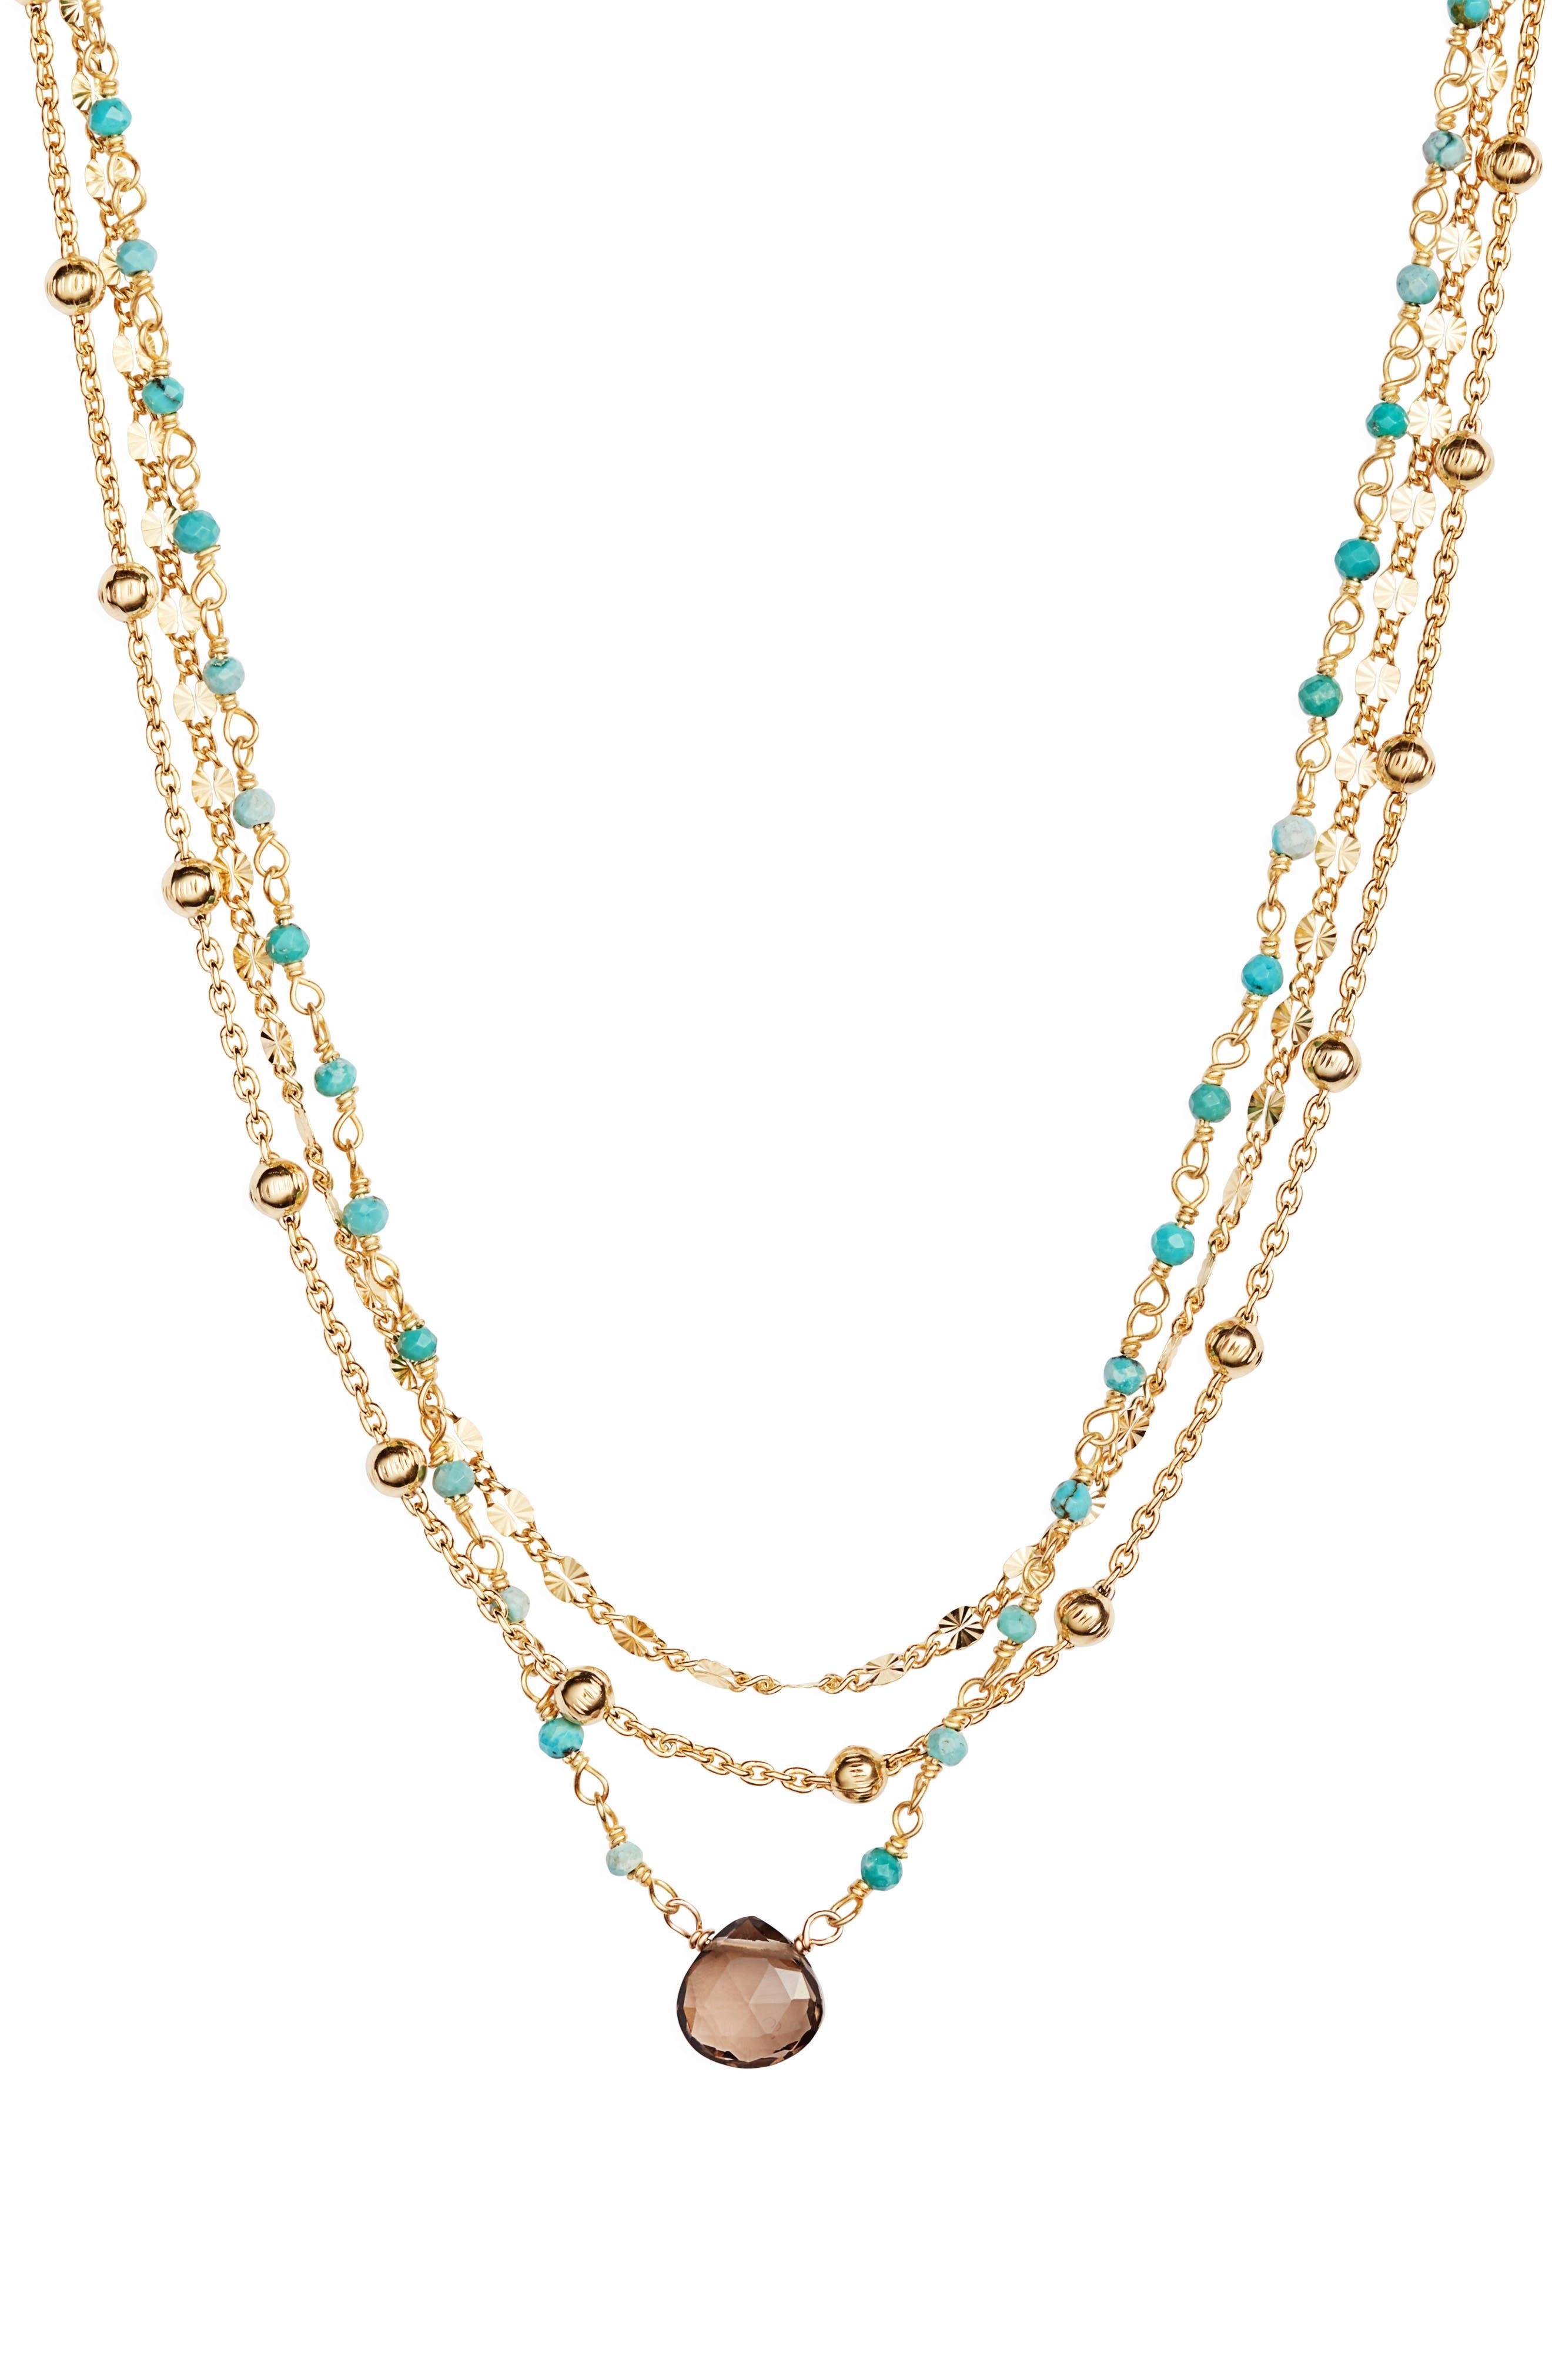 Lina Semiprecious Stone Multistrand Necklace